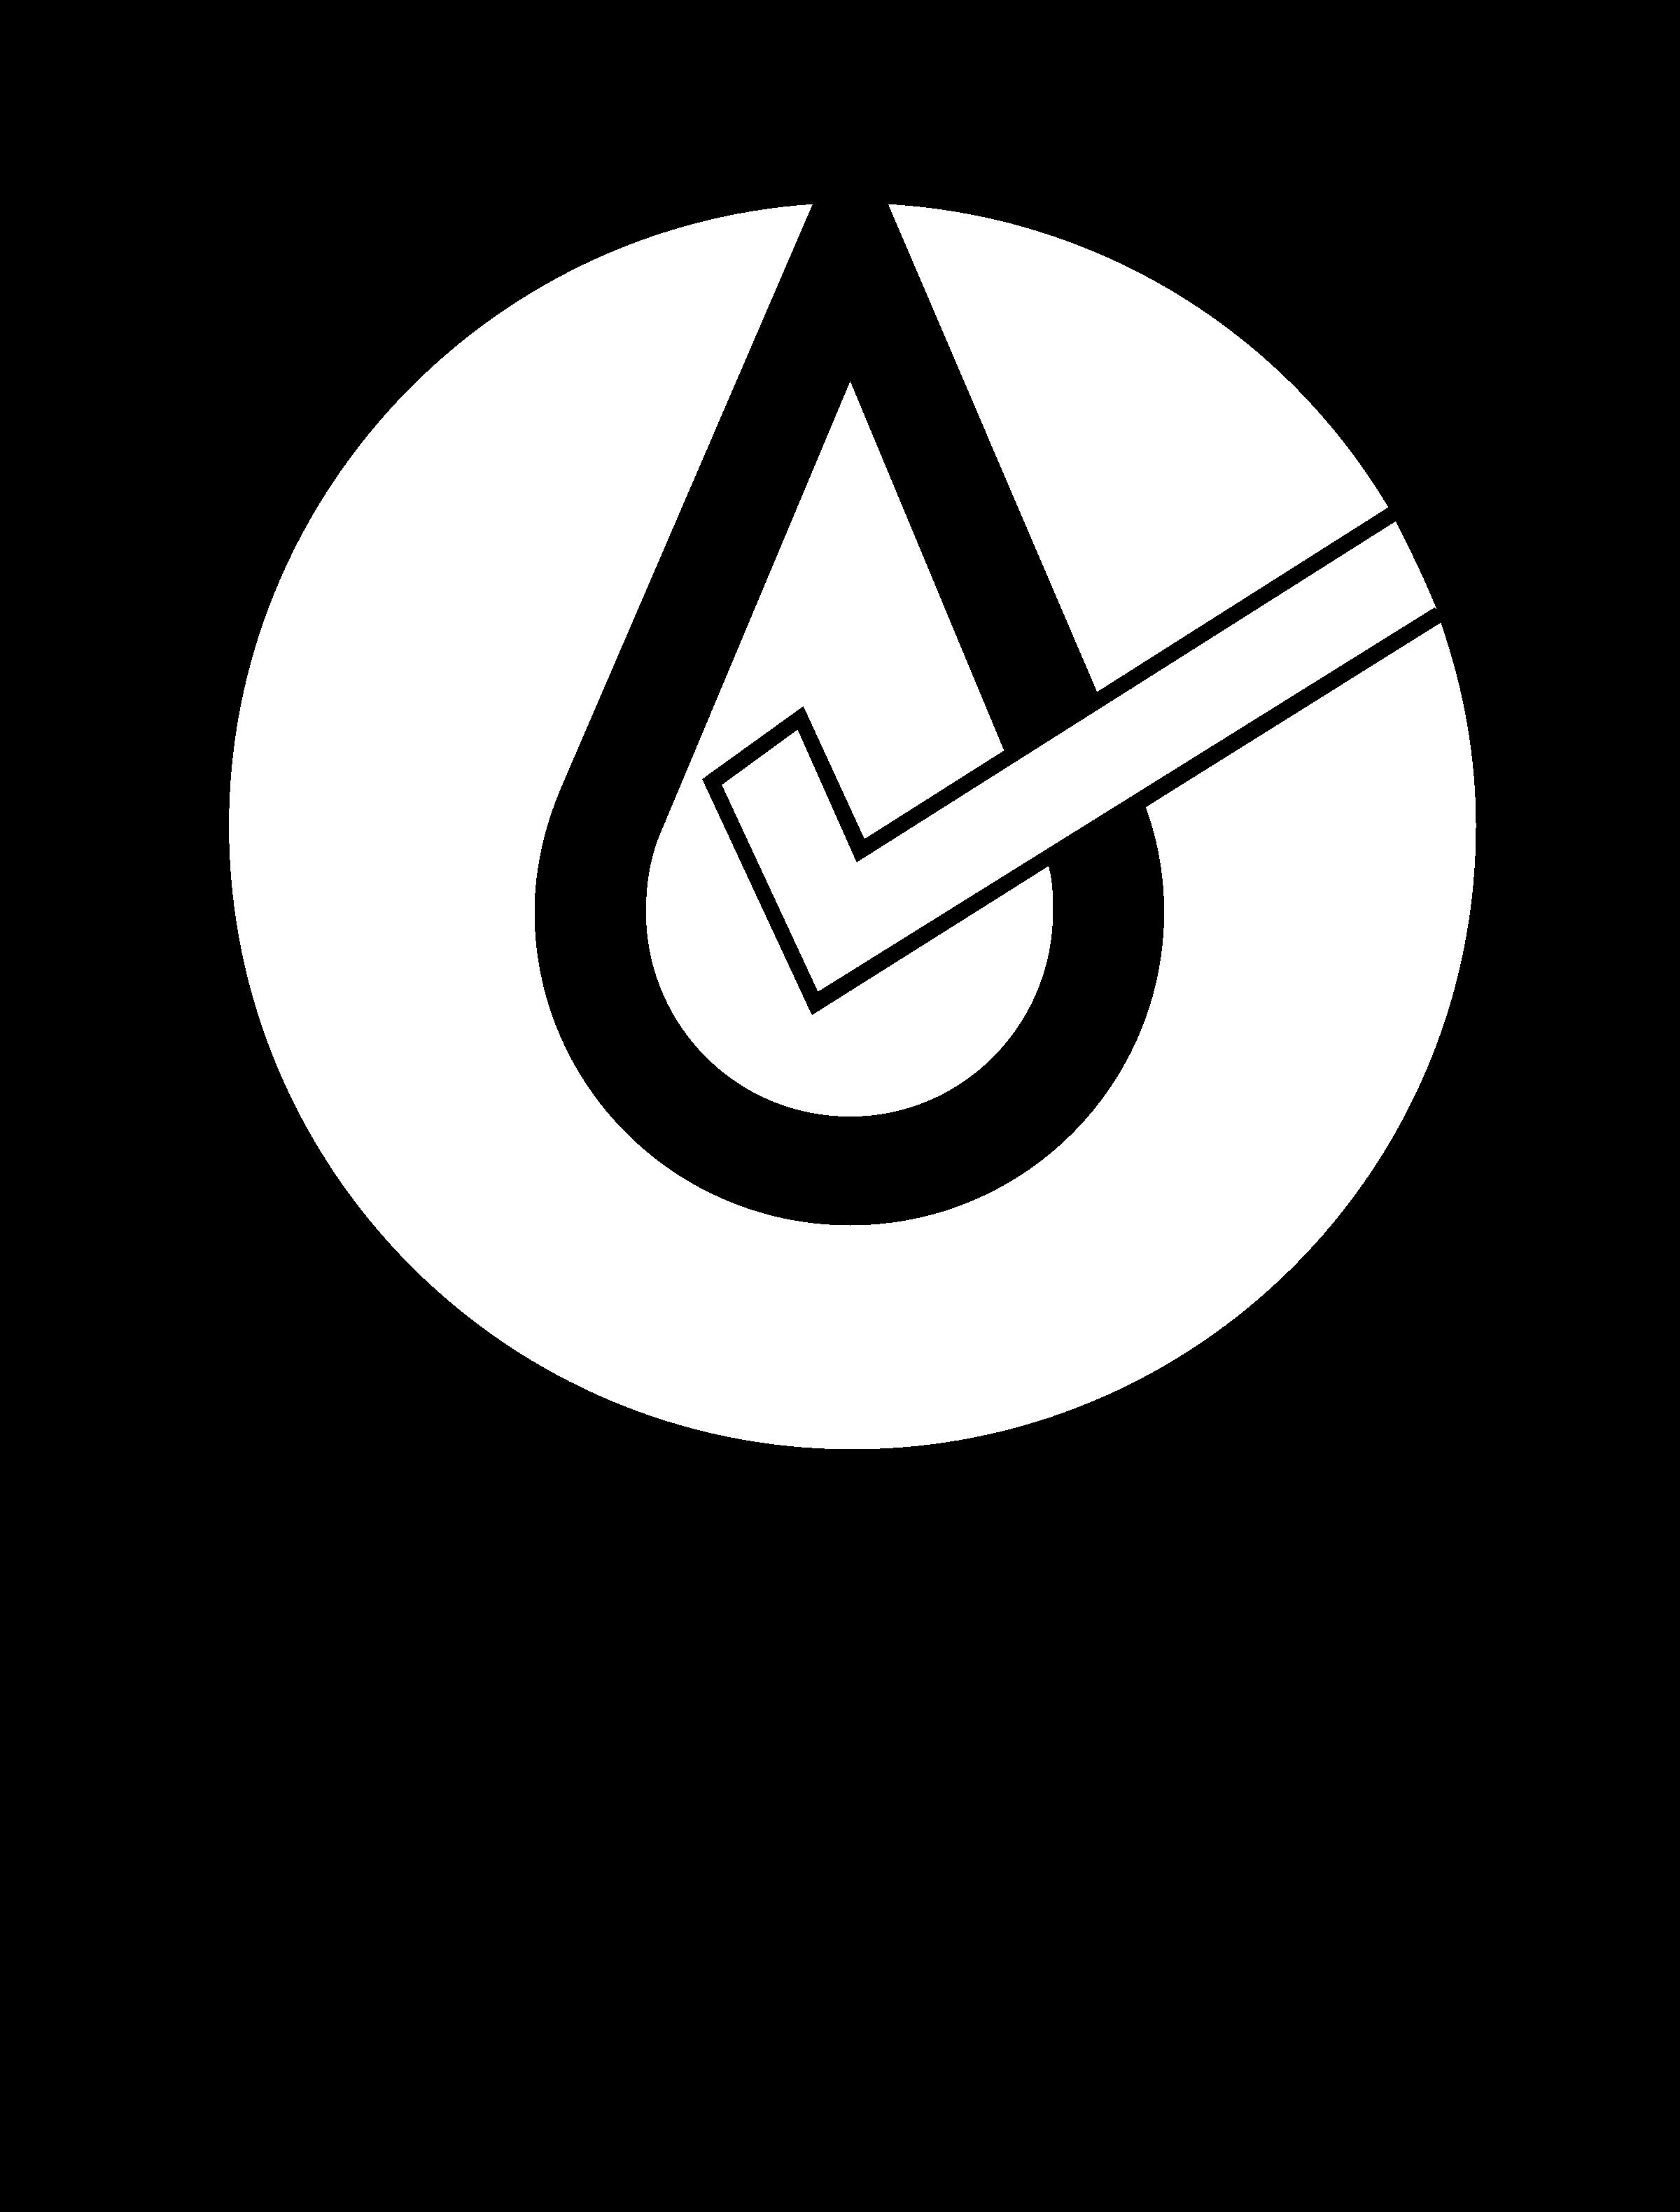 Caterpillar Sos Logo Png Transparent Svg Vector Freebie Supply